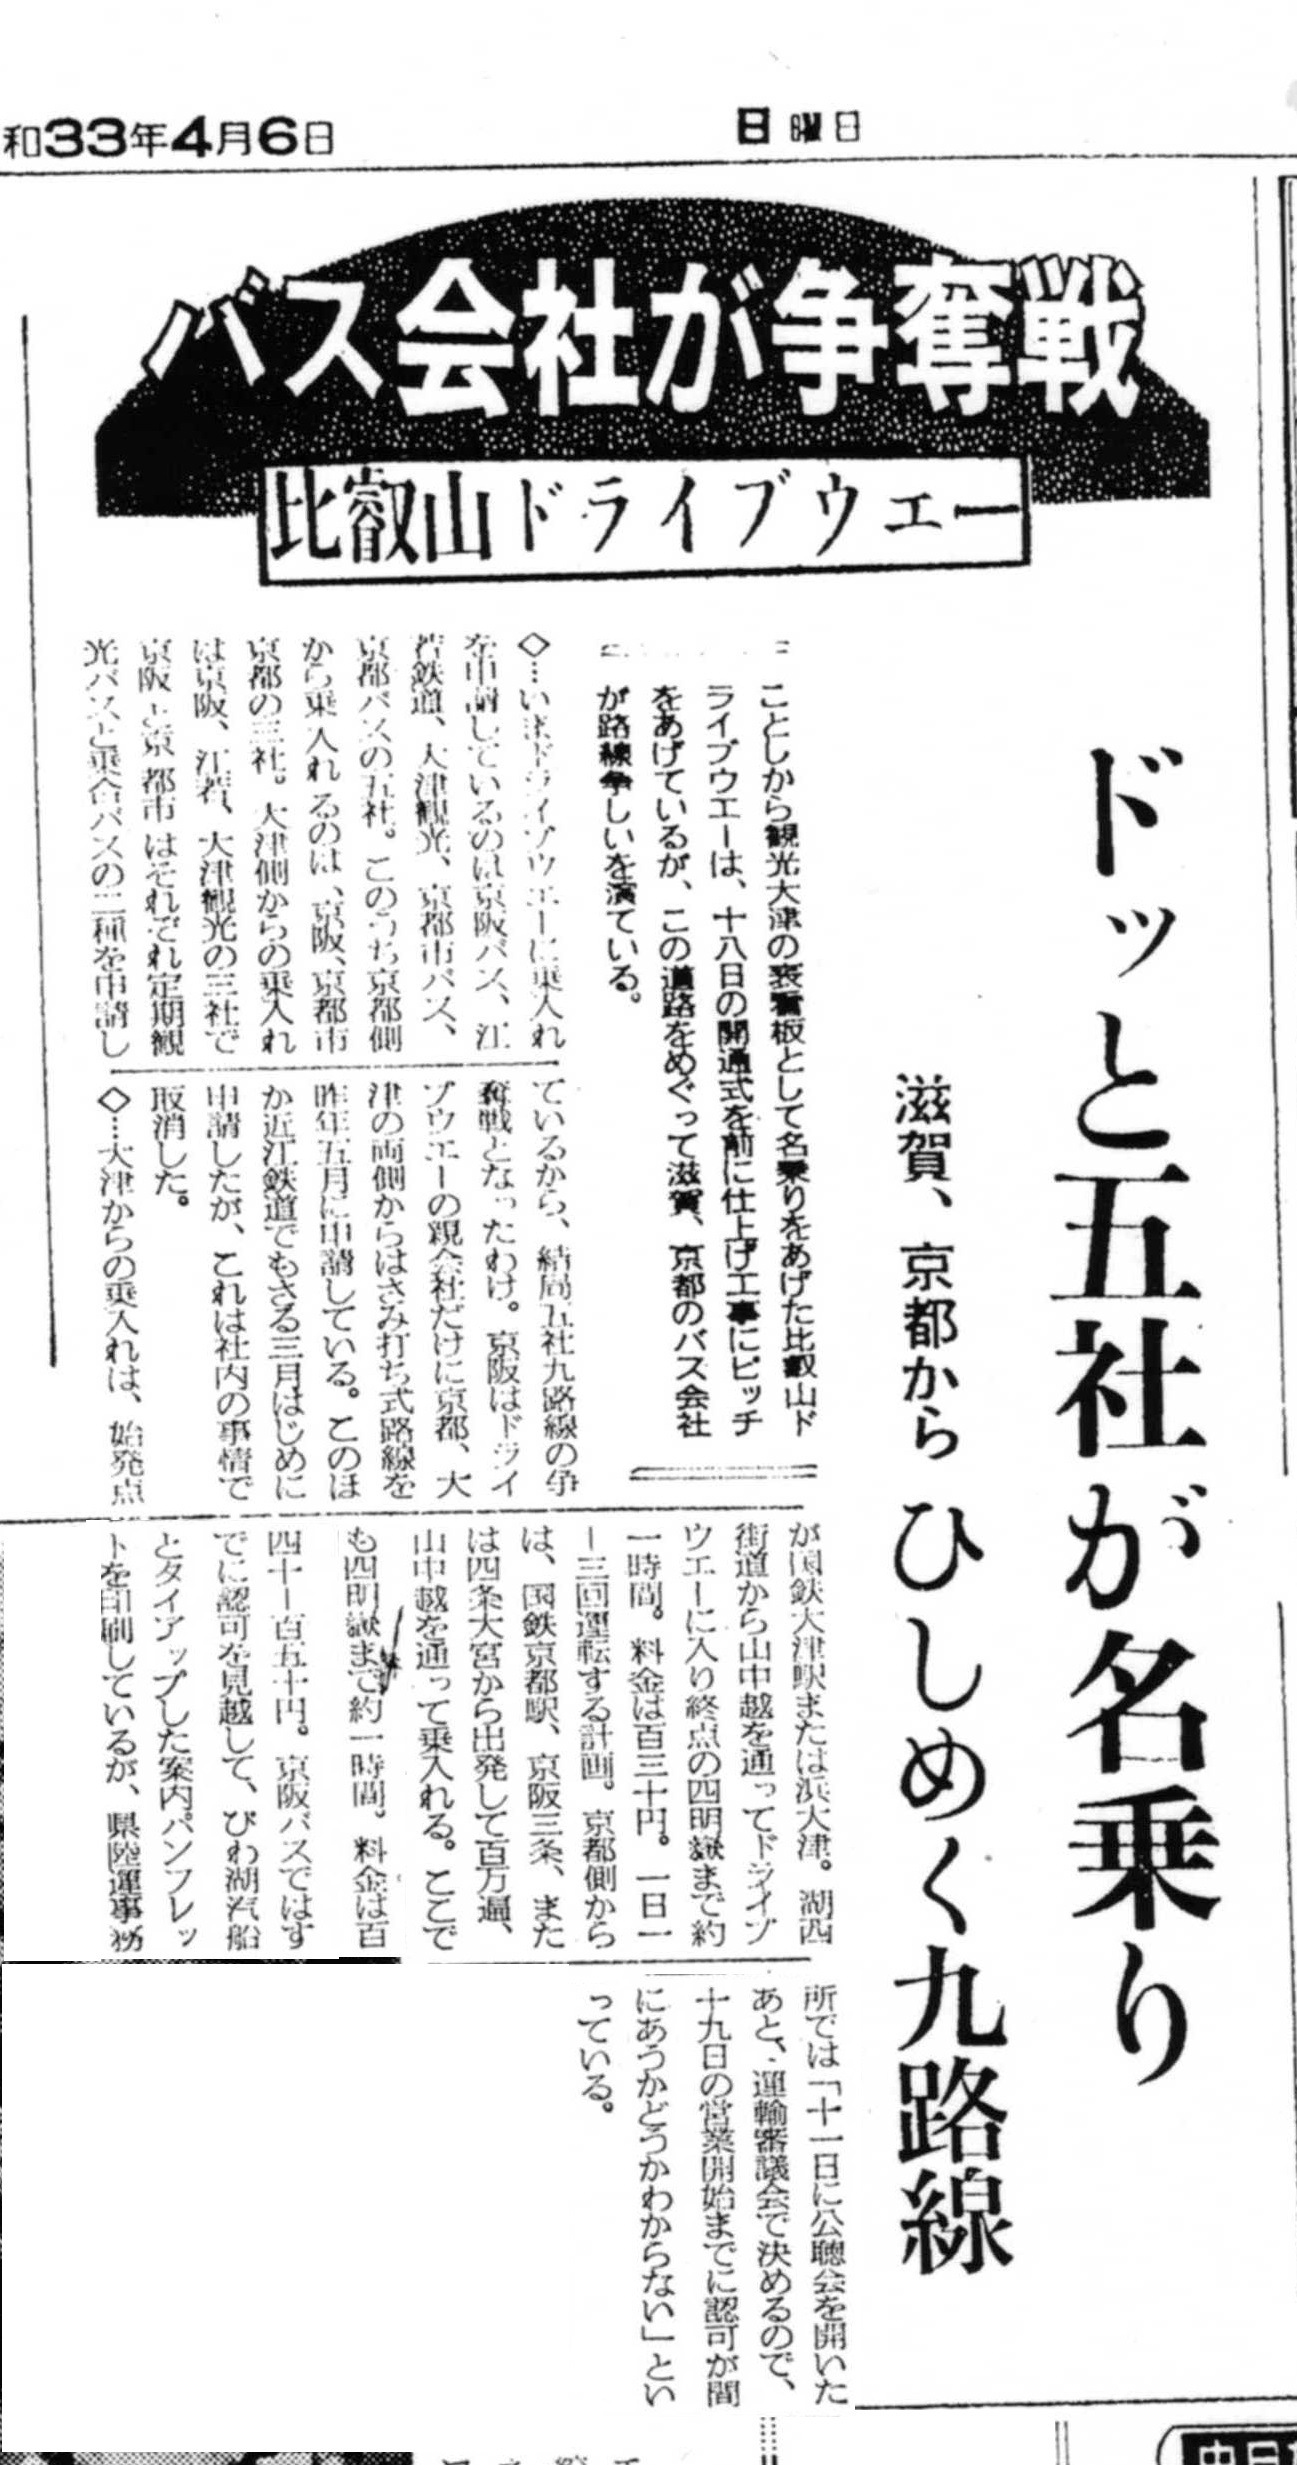 S33.4.6Sa 比叡山DW バス路線争奪戦b